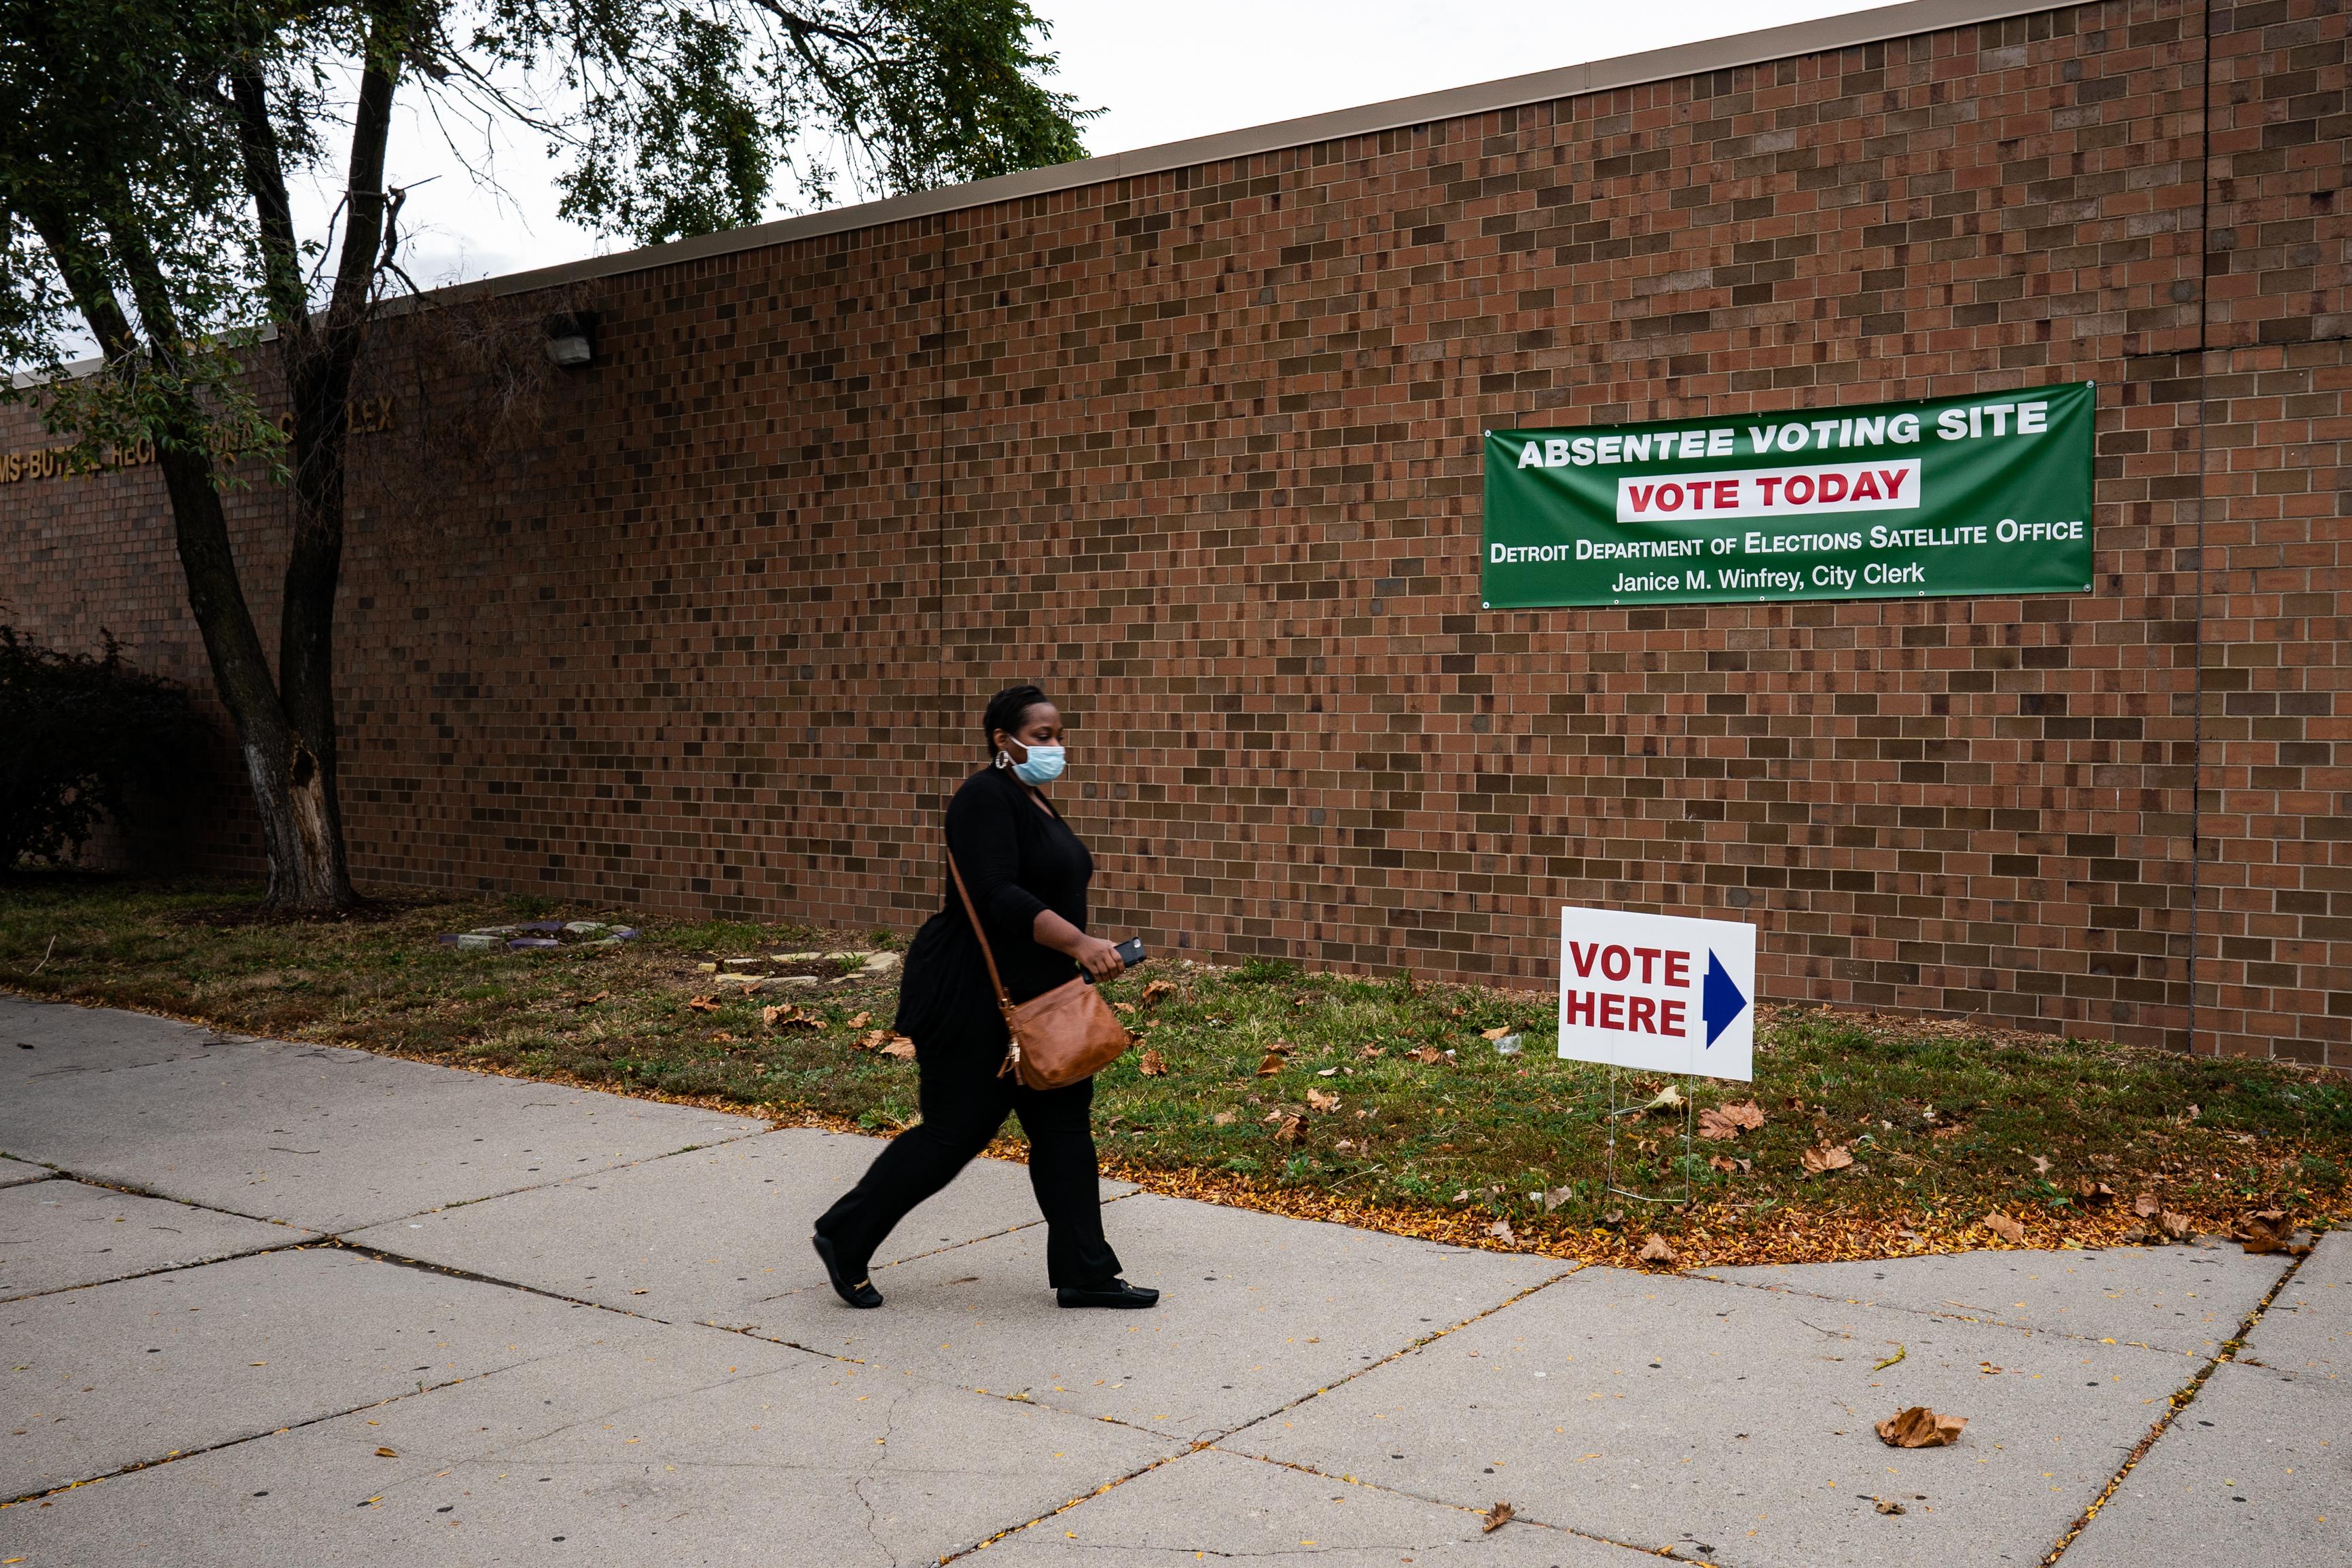 Virus Surges in Key Battleground States as Election Nears 1